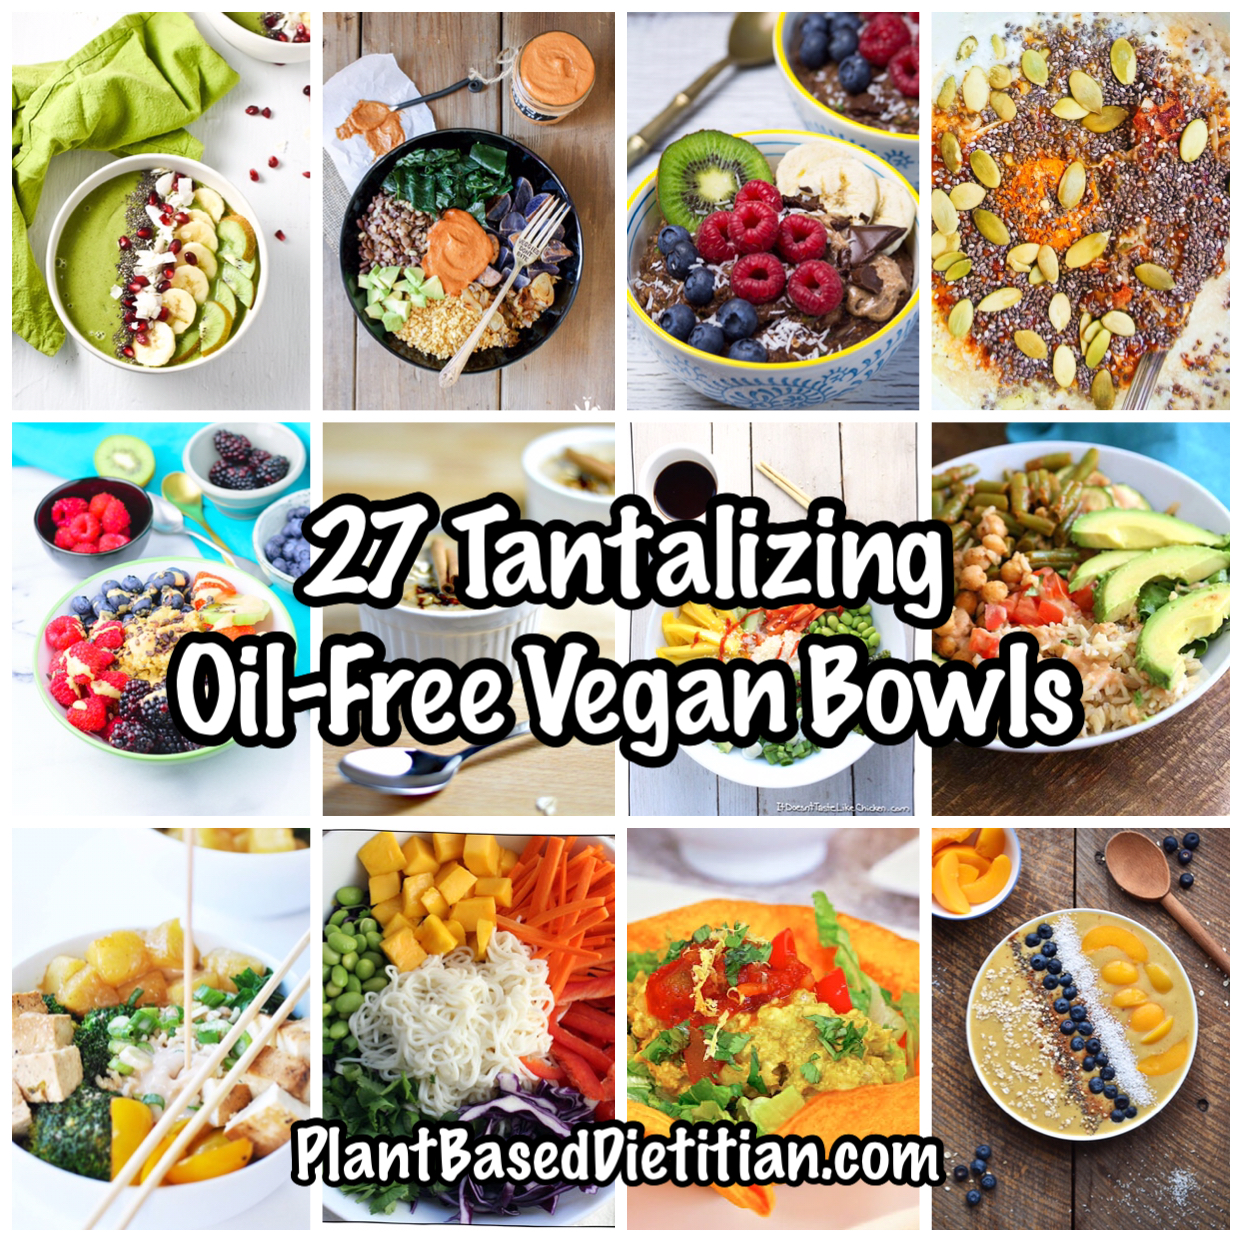 Bowls 27